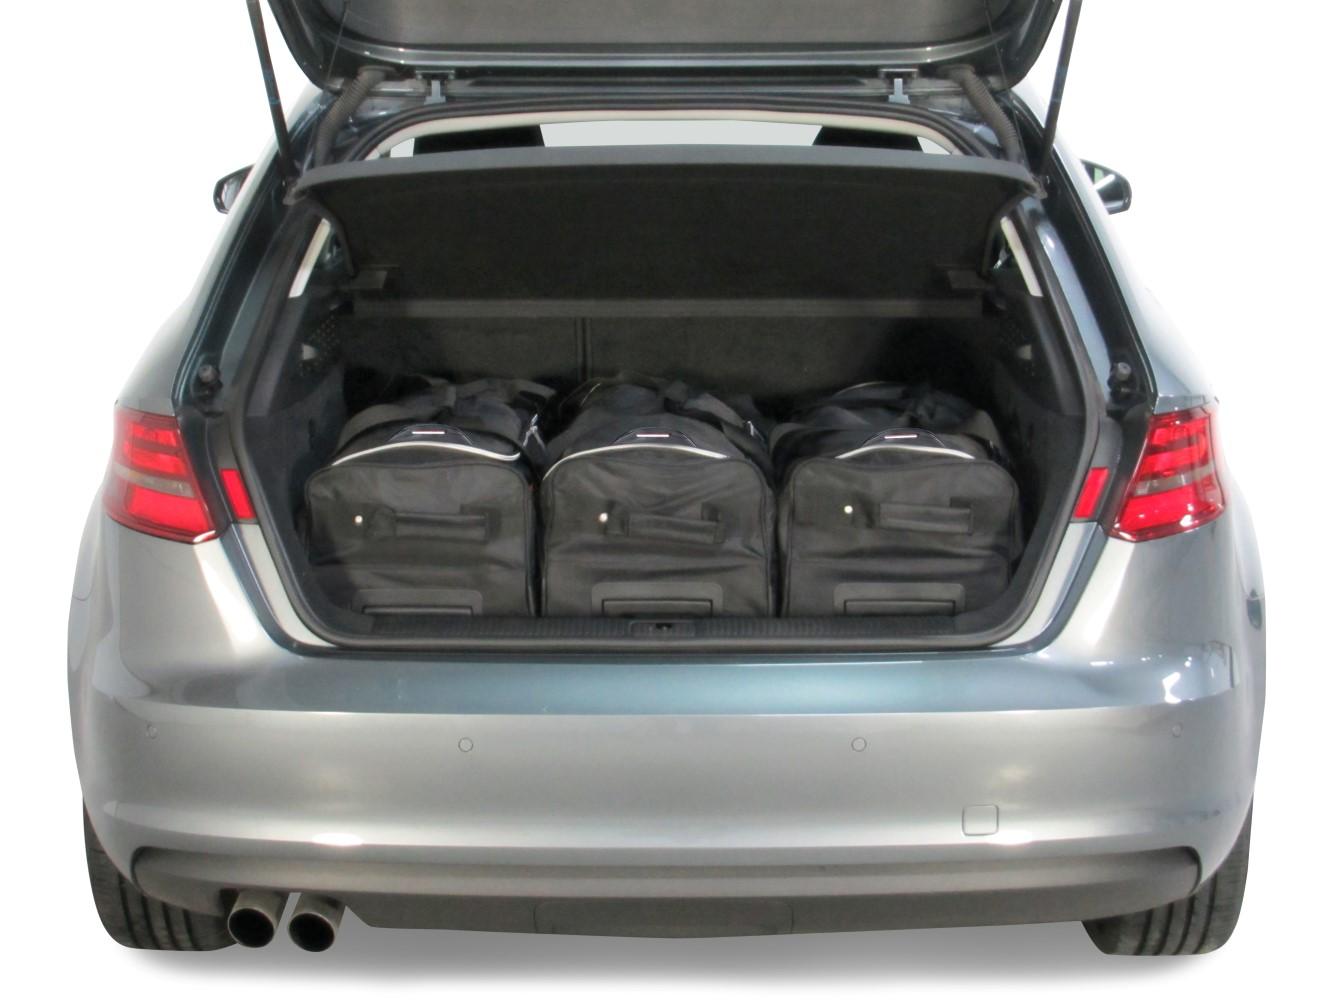 Car-Bags Audi A3 Sportback (8V) 2013-présent 5p Car-Bags Set De Sacs De Voyage A21601S mfGATqm8em